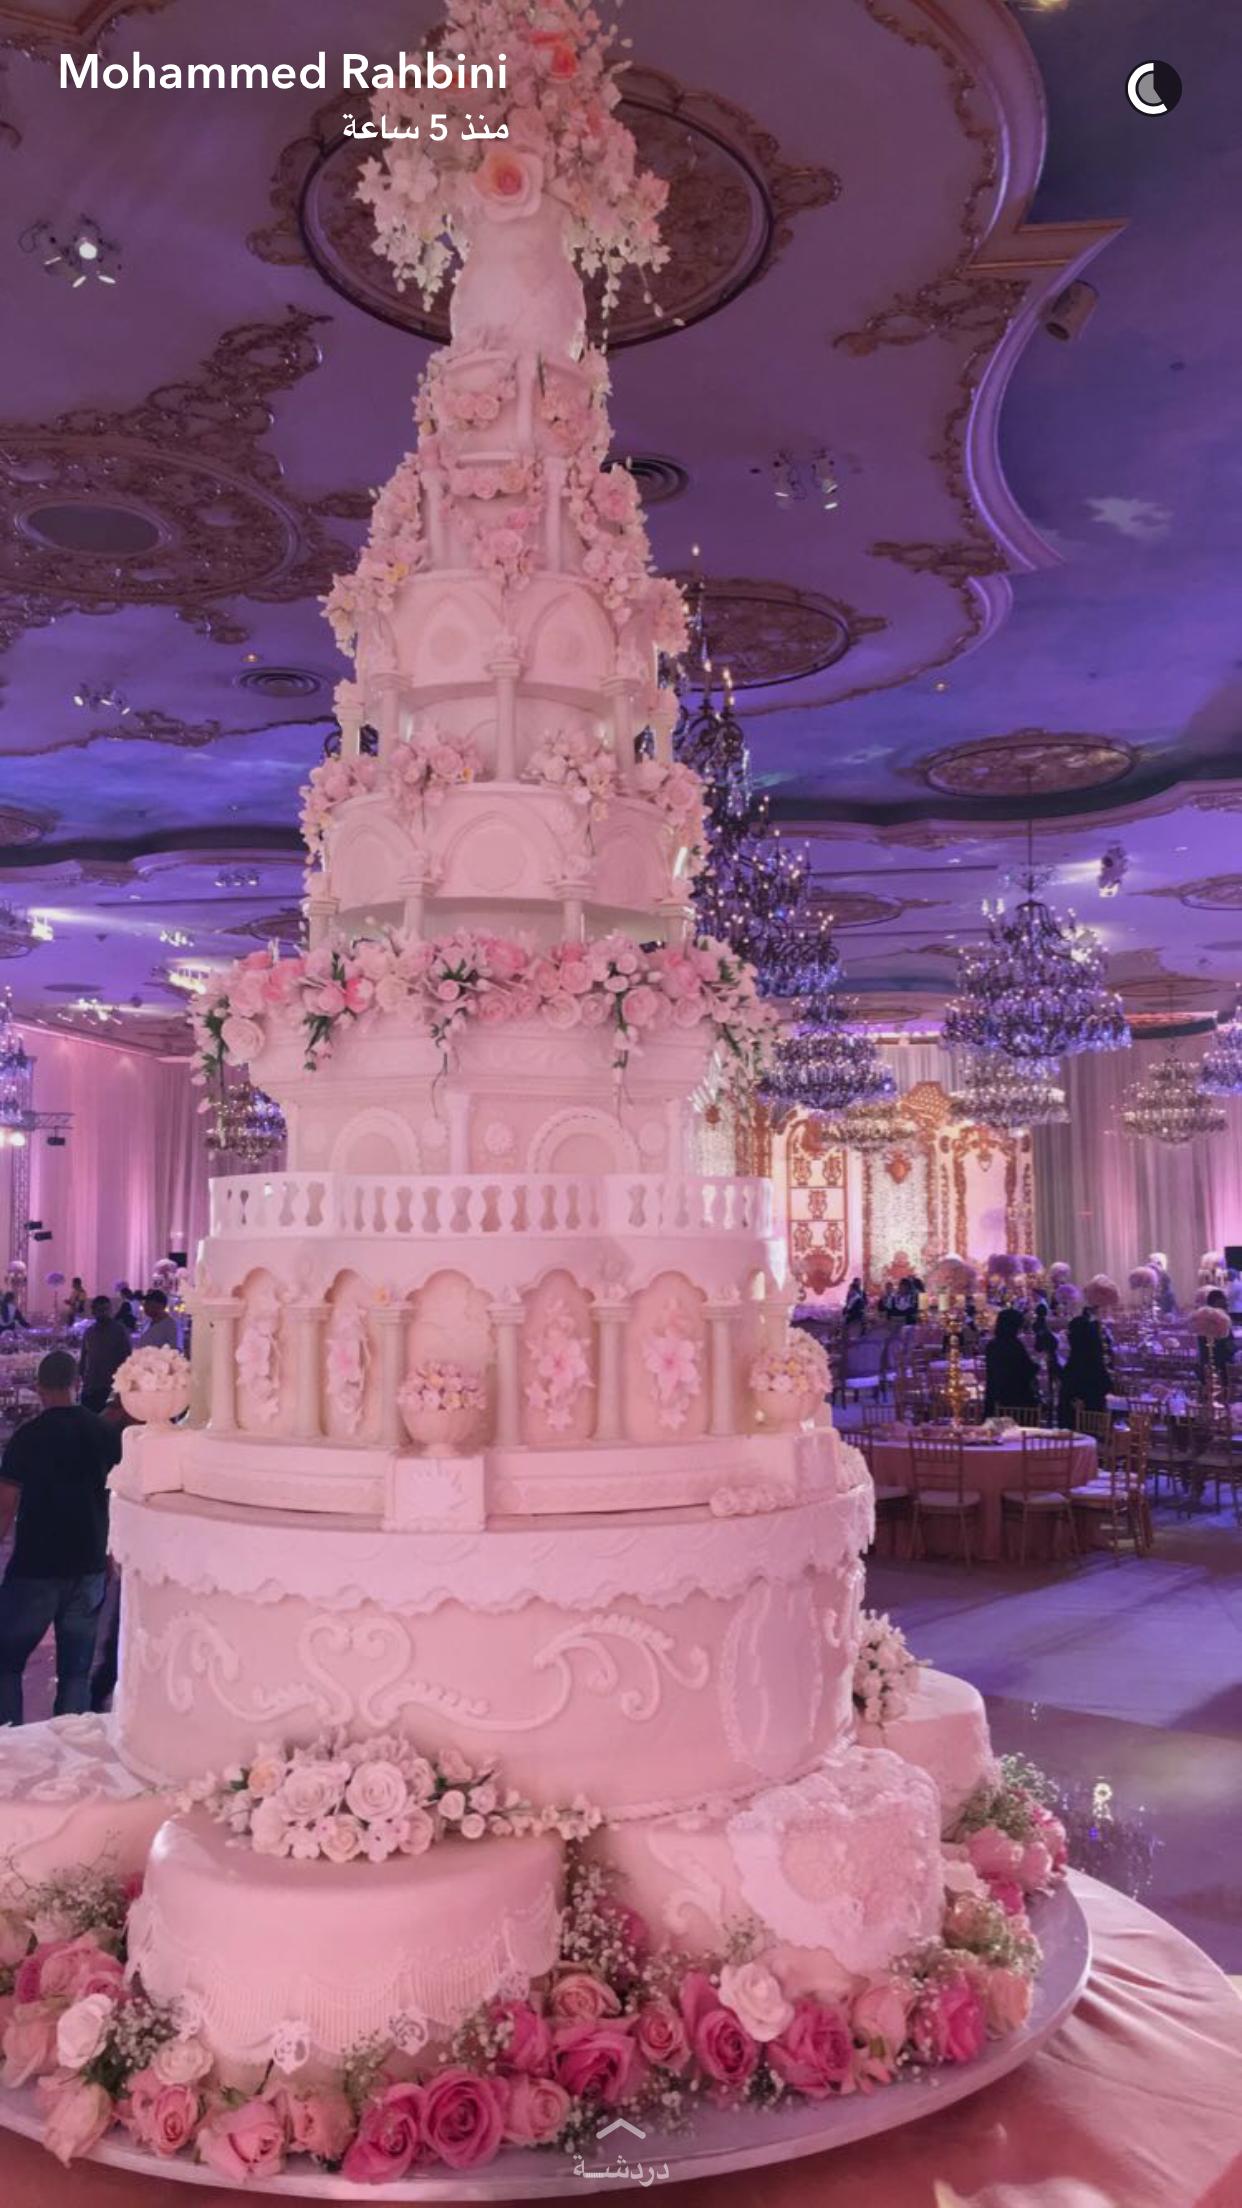 Elaborate Wedding Cake Huge wedding cakes, Crazy wedding